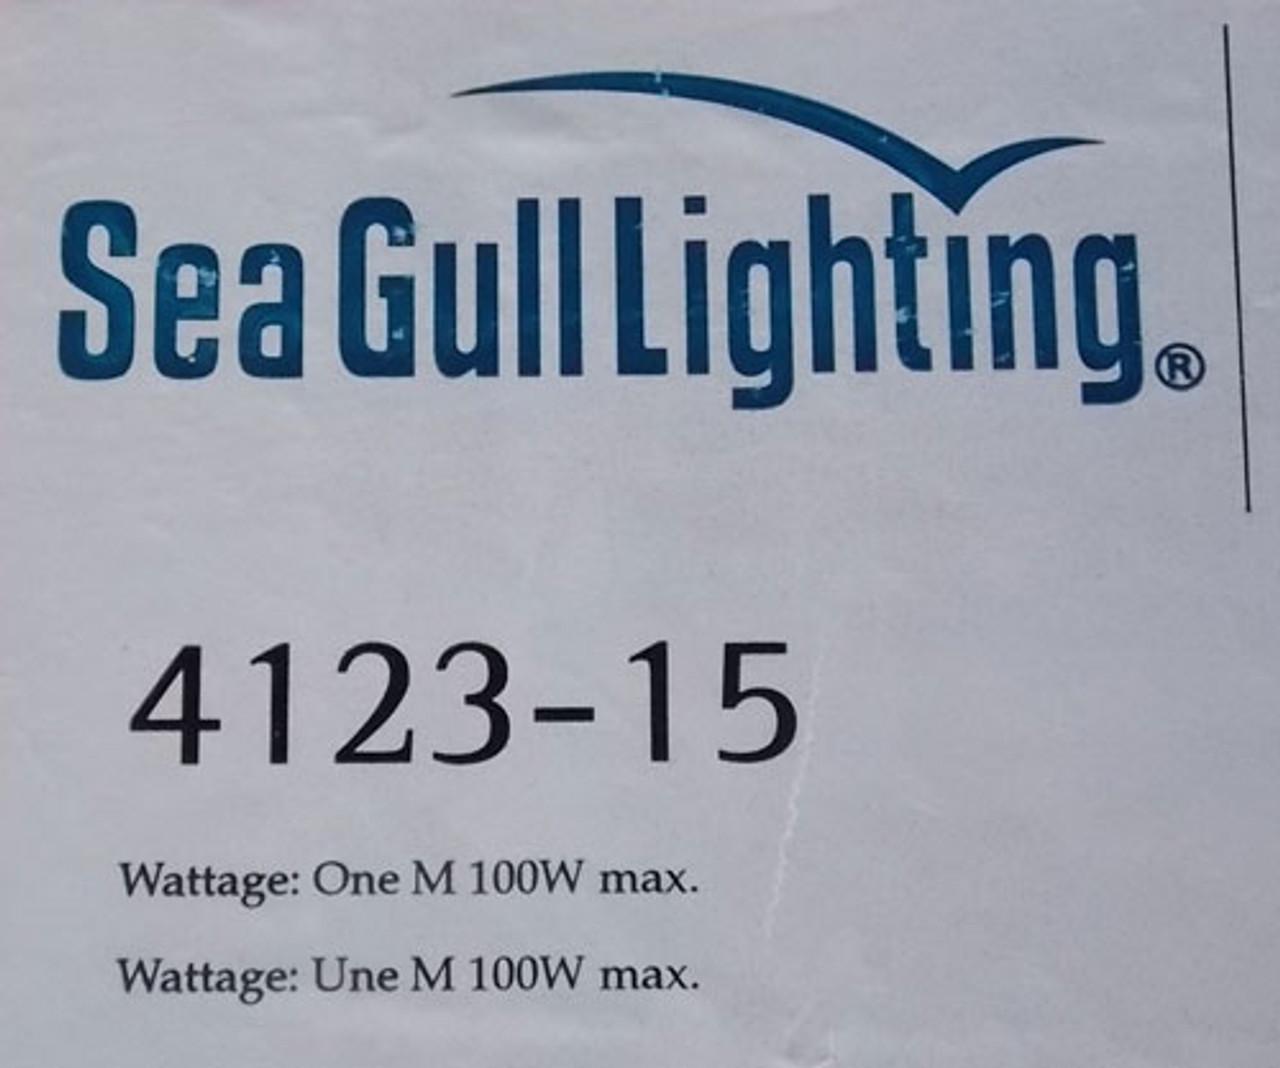 Sea Gull Lighting 4123-15 120V One-Light Decorative Wall Sconce White